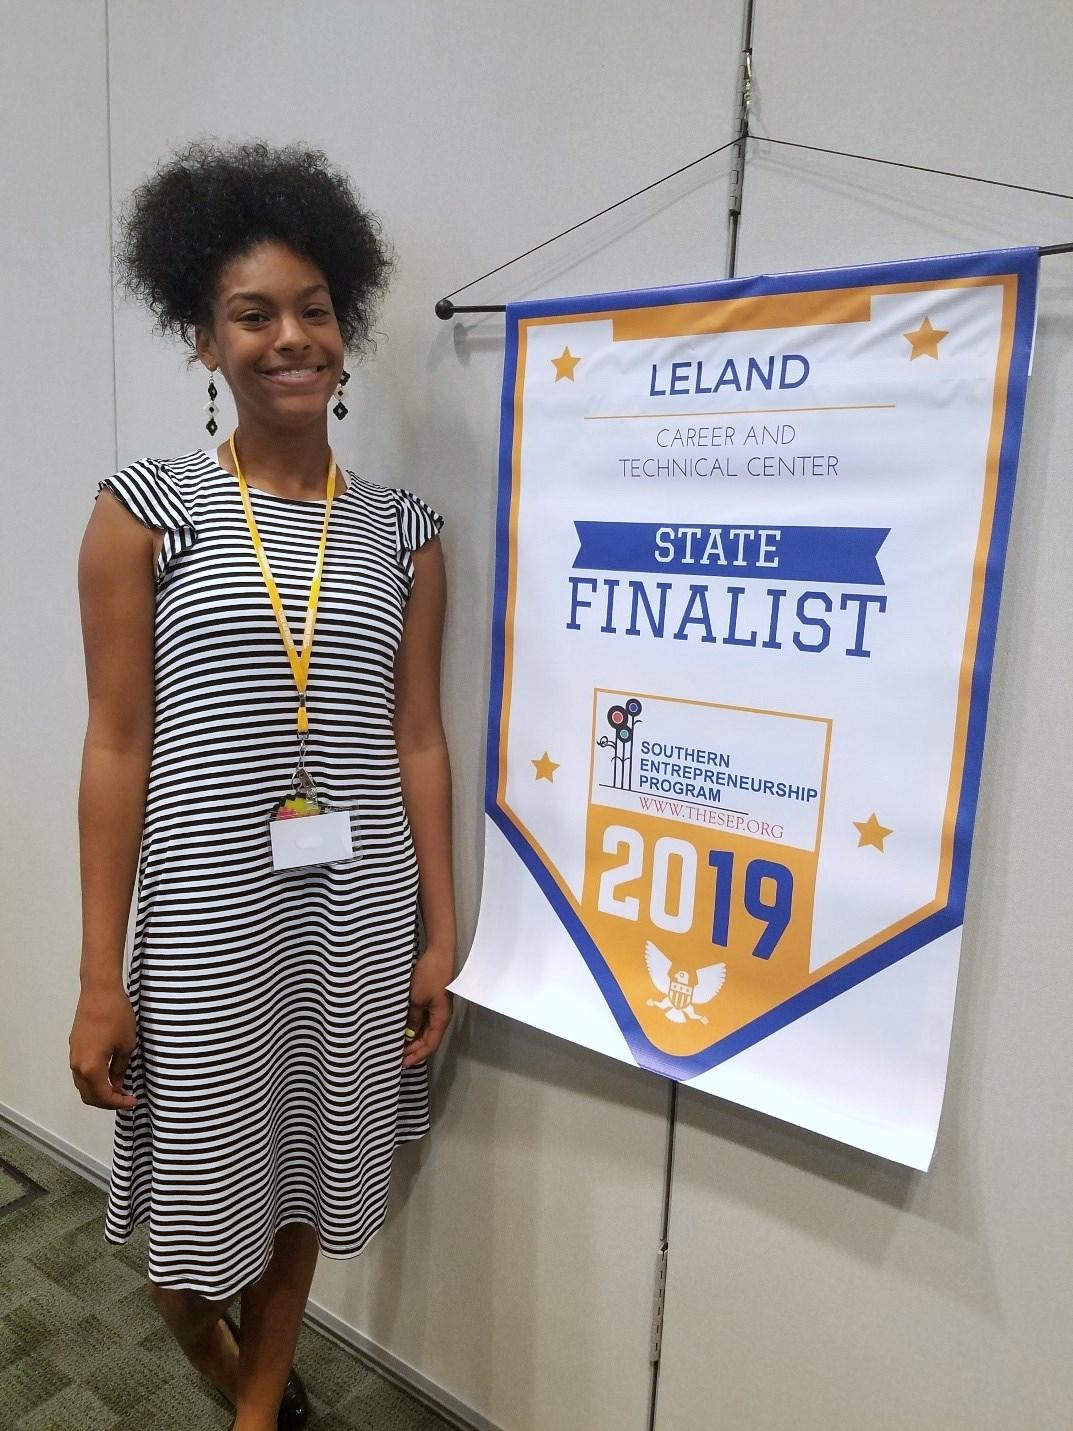 Yasmin Colon, state finalist in Southern Entrepreneurship Program of FBLA